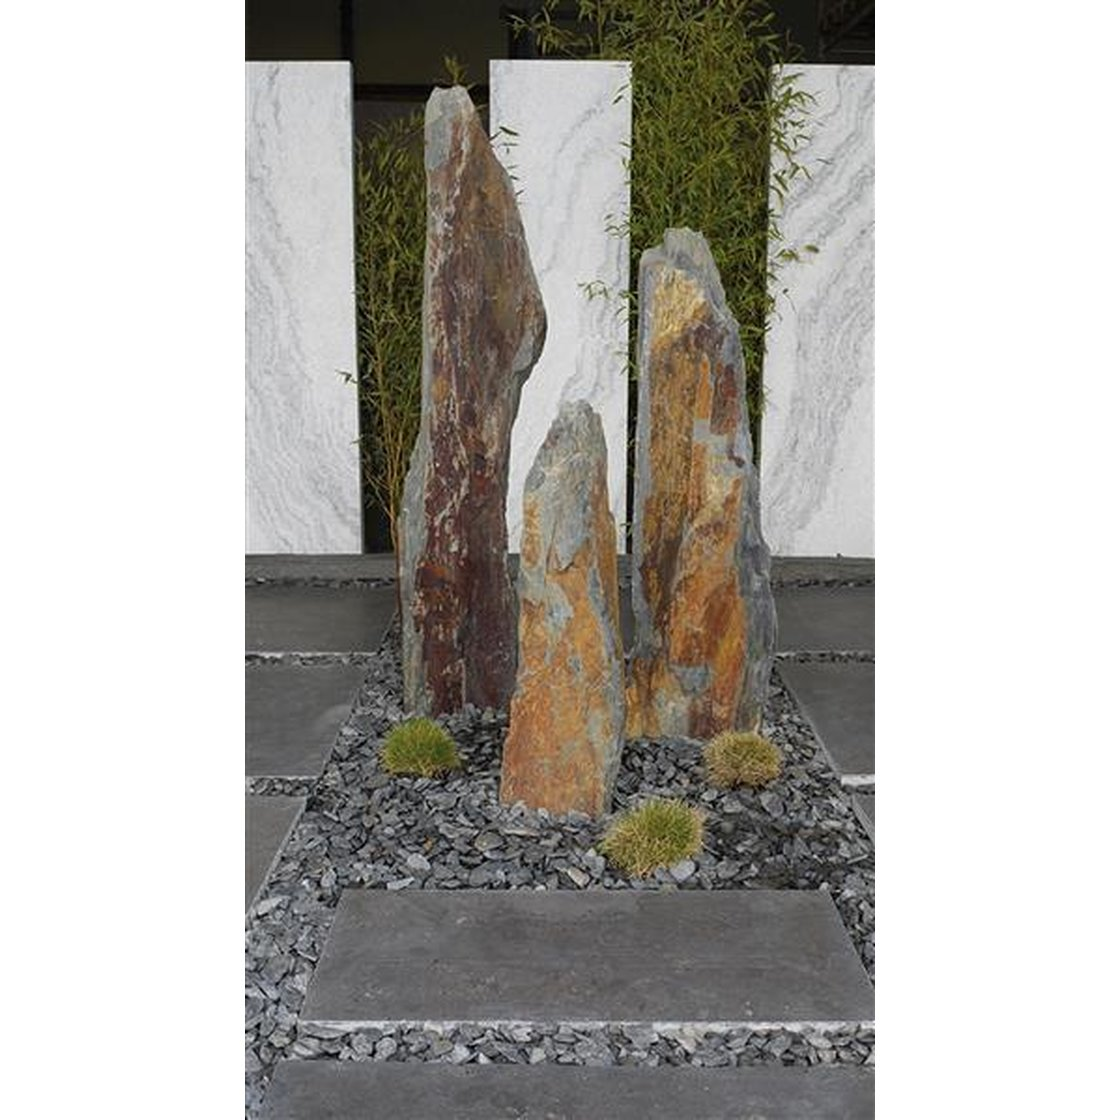 Schiefersaeule braun bunt mit Betonsockel 80 cm